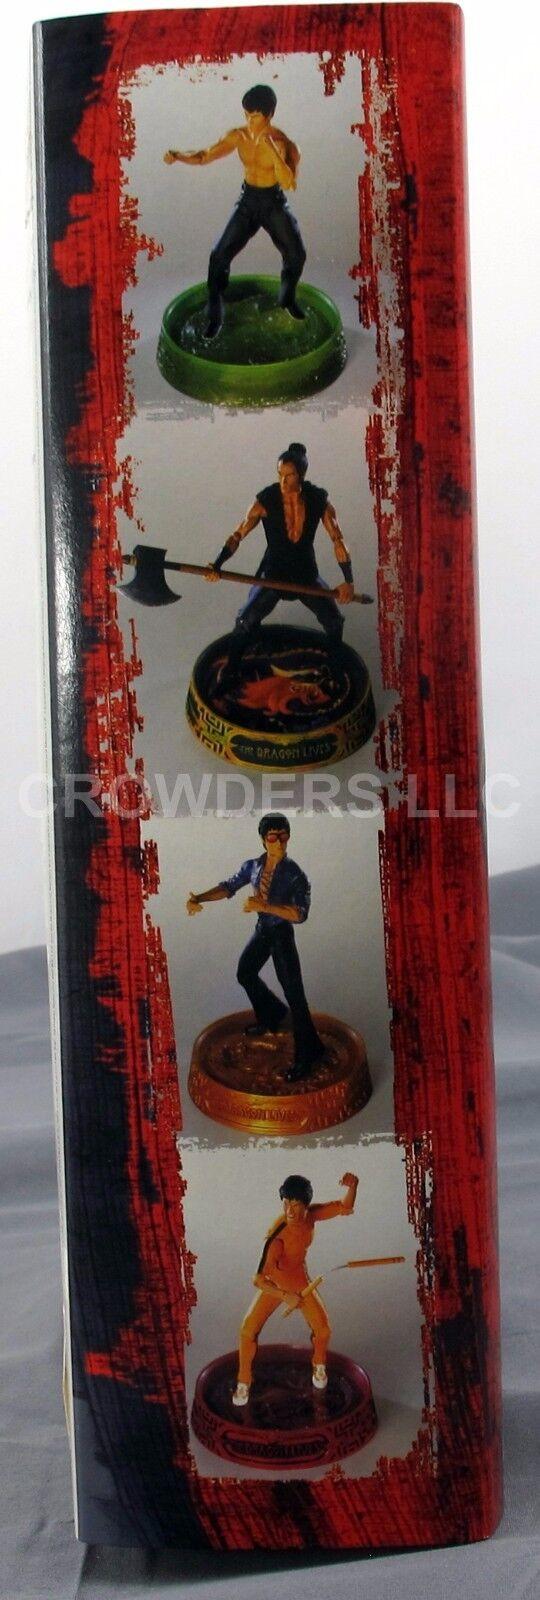 Bruce Lee The Dragon Lives Lives Lives IMMORTAL DRAGON 7  azione cifra Art Asylum NIP 2001 386d0f